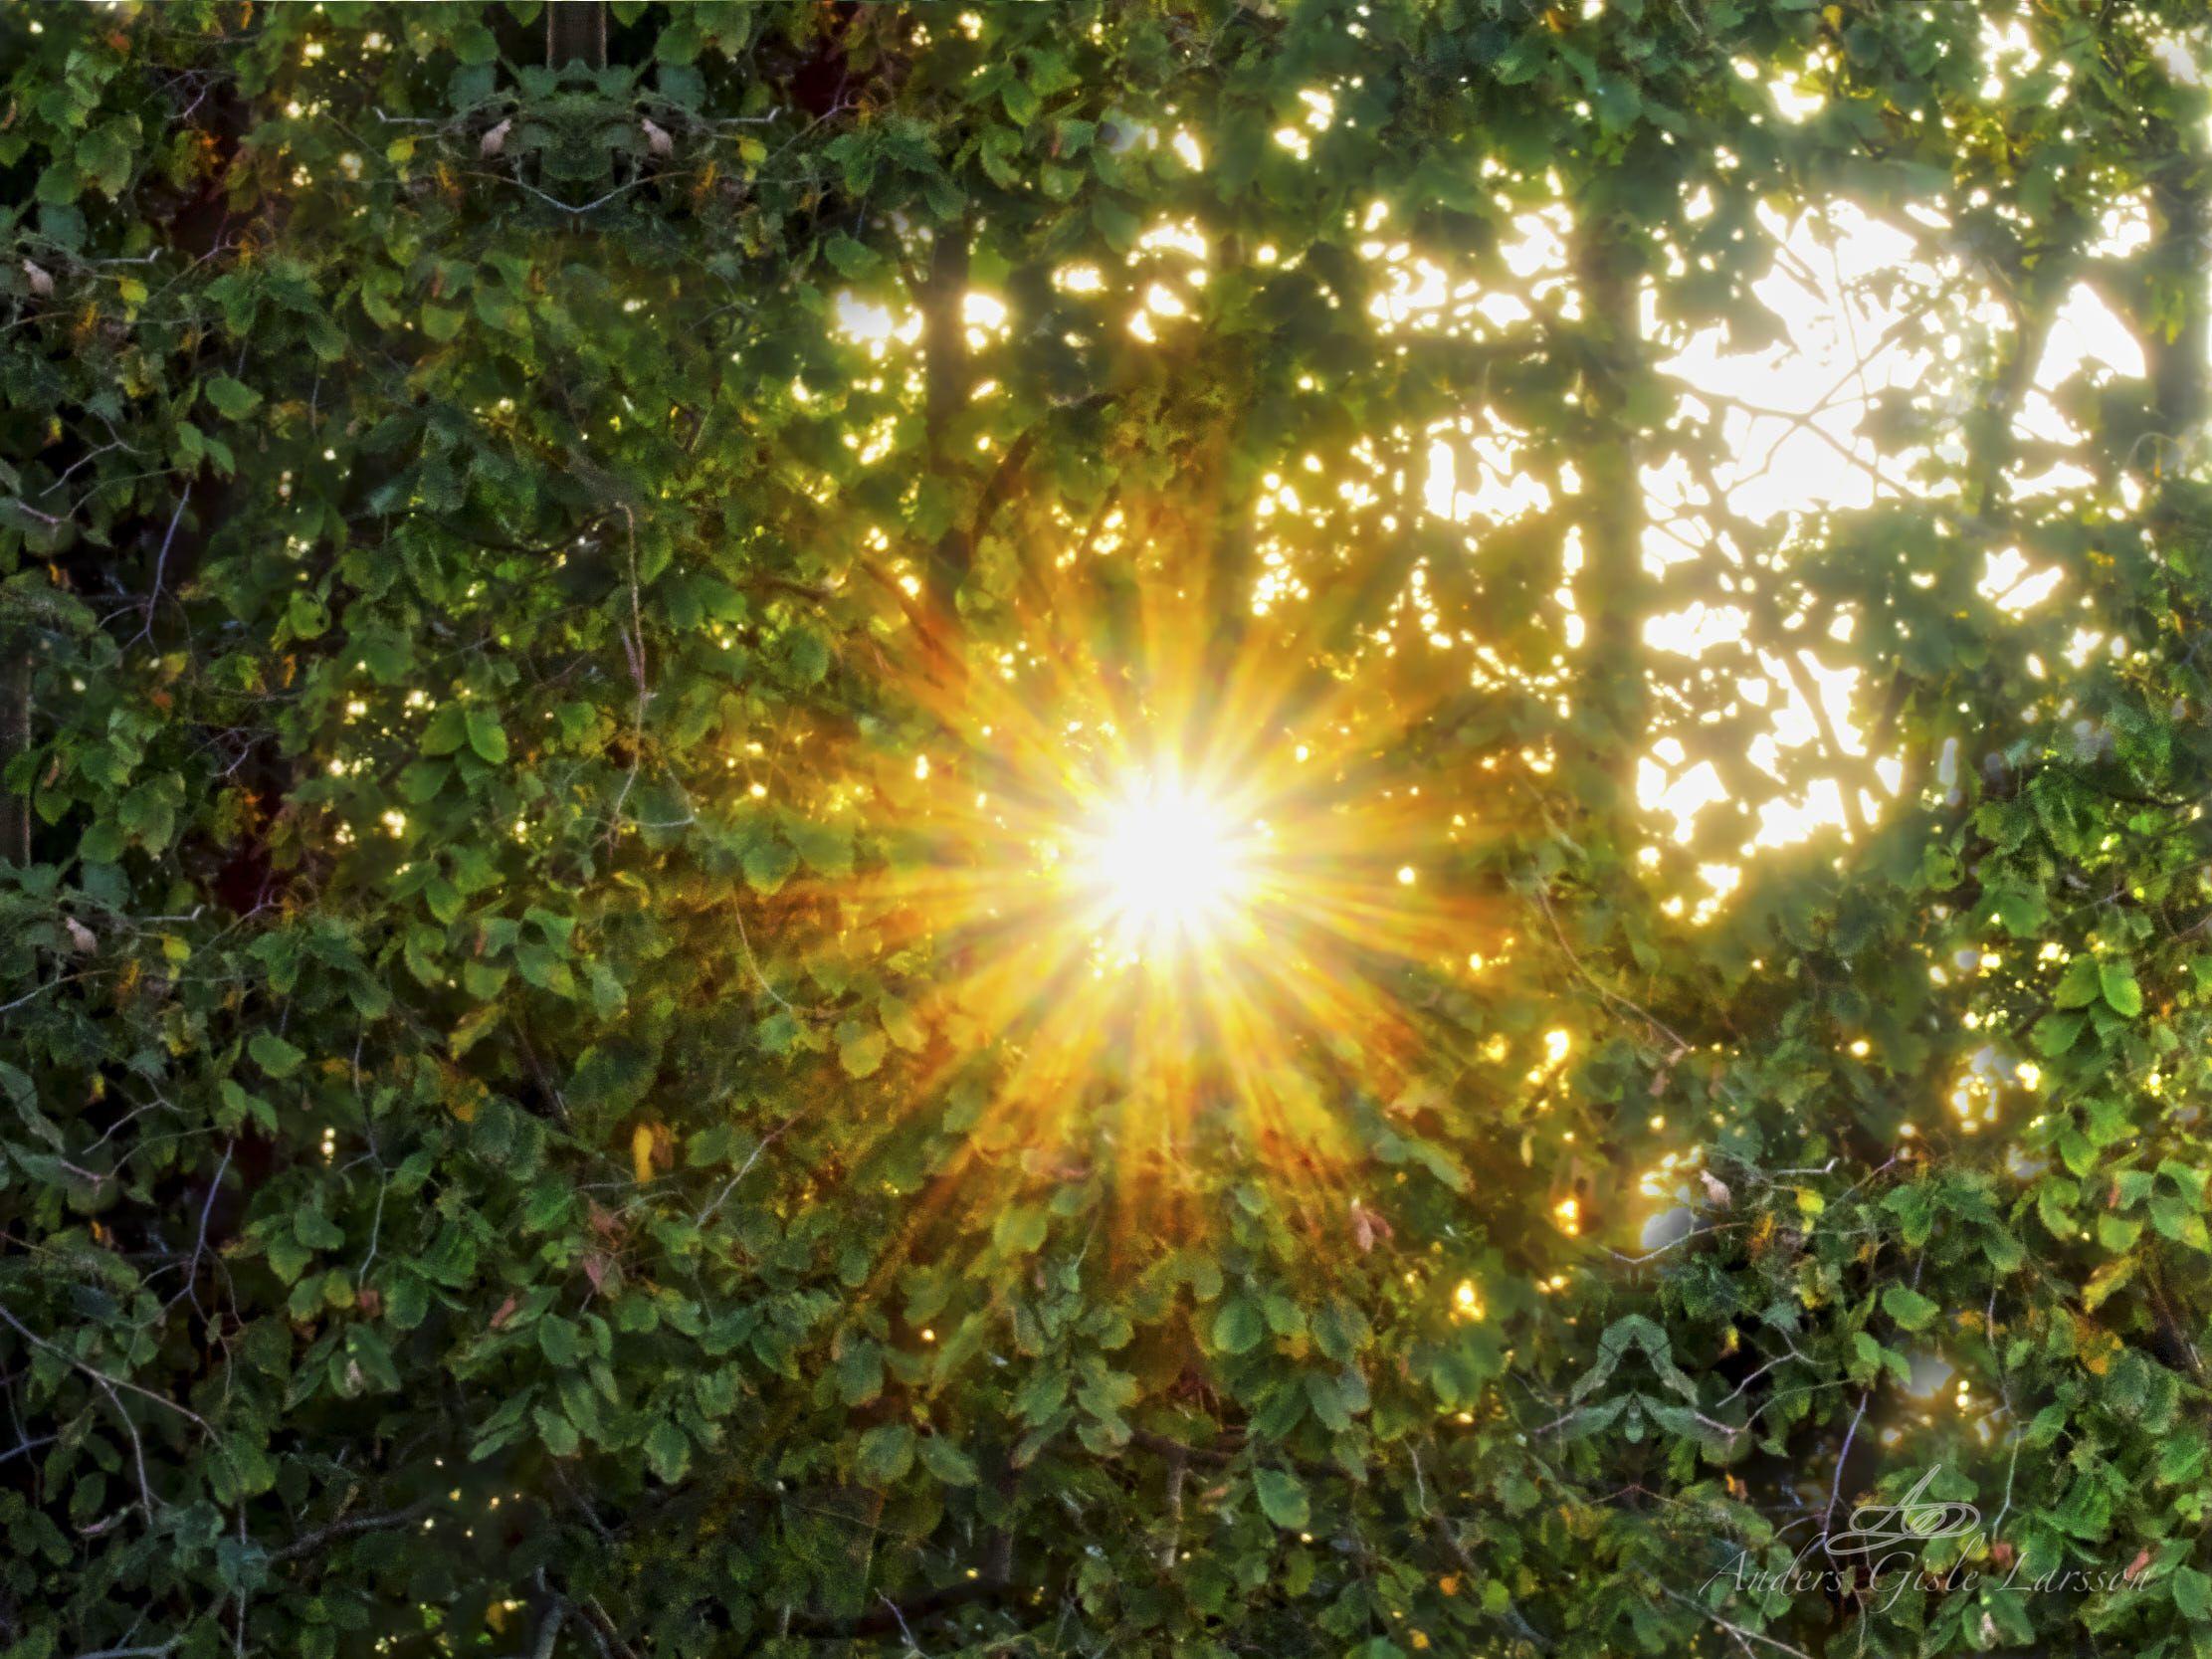 365/365, Sol stjerne, Assentoft, Randers